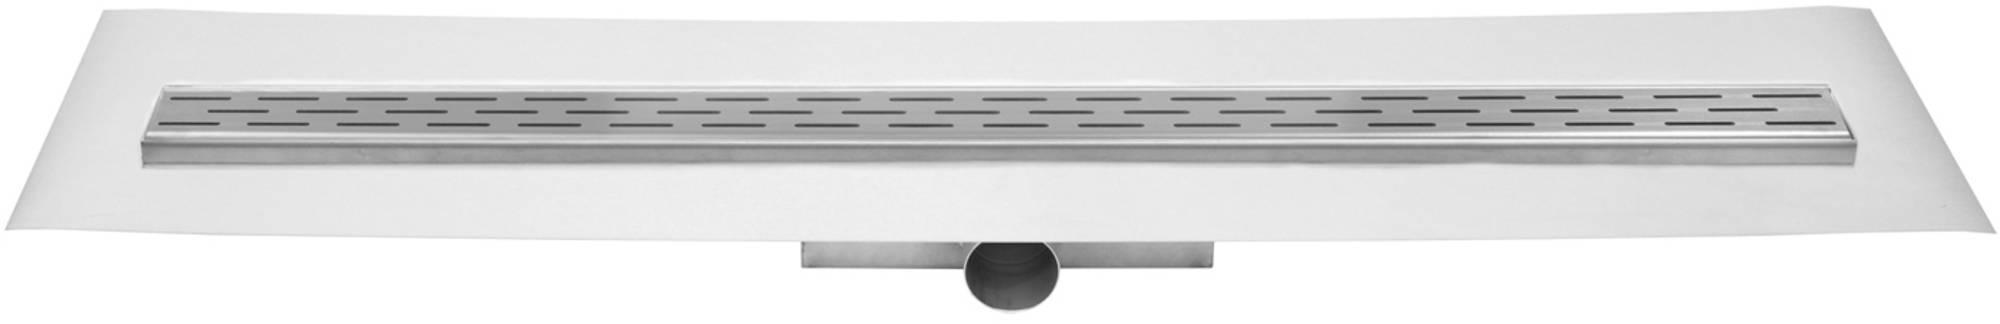 Easydrain Compact Douchegoot 70 x 6 cm RVS